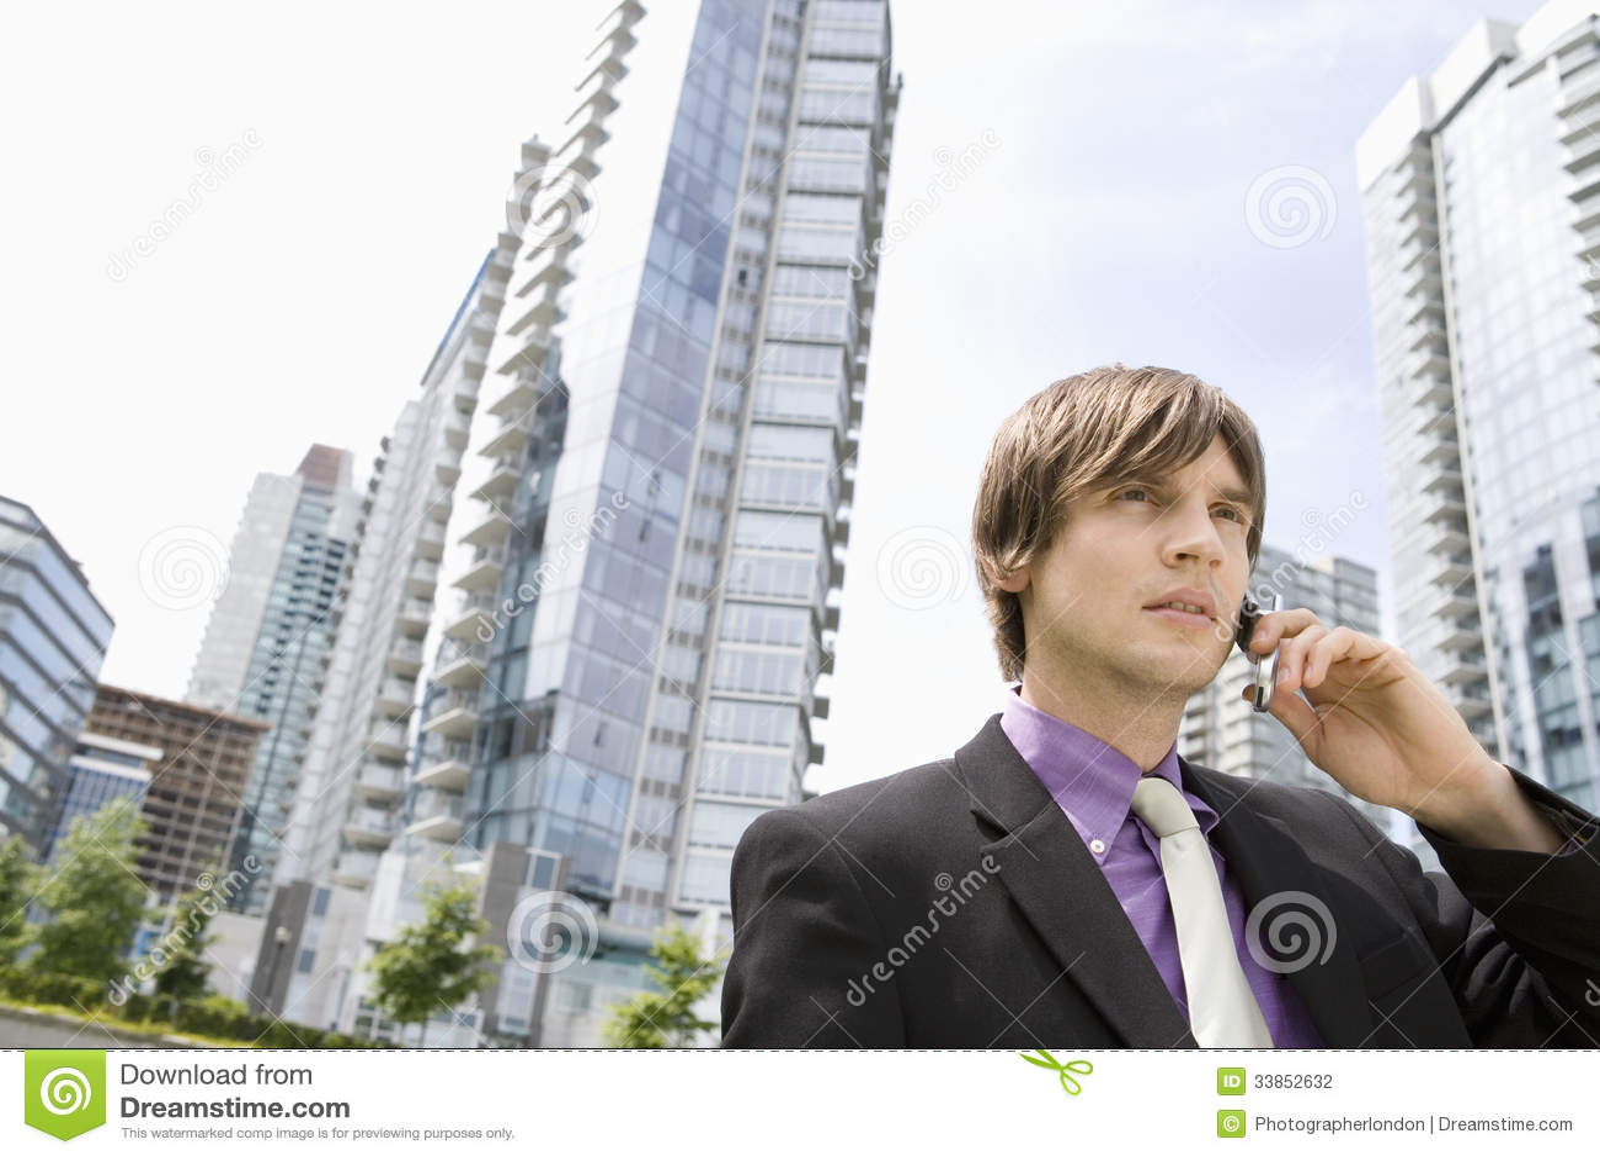 Edificios de Using Cellphone Against del hombre de negocios